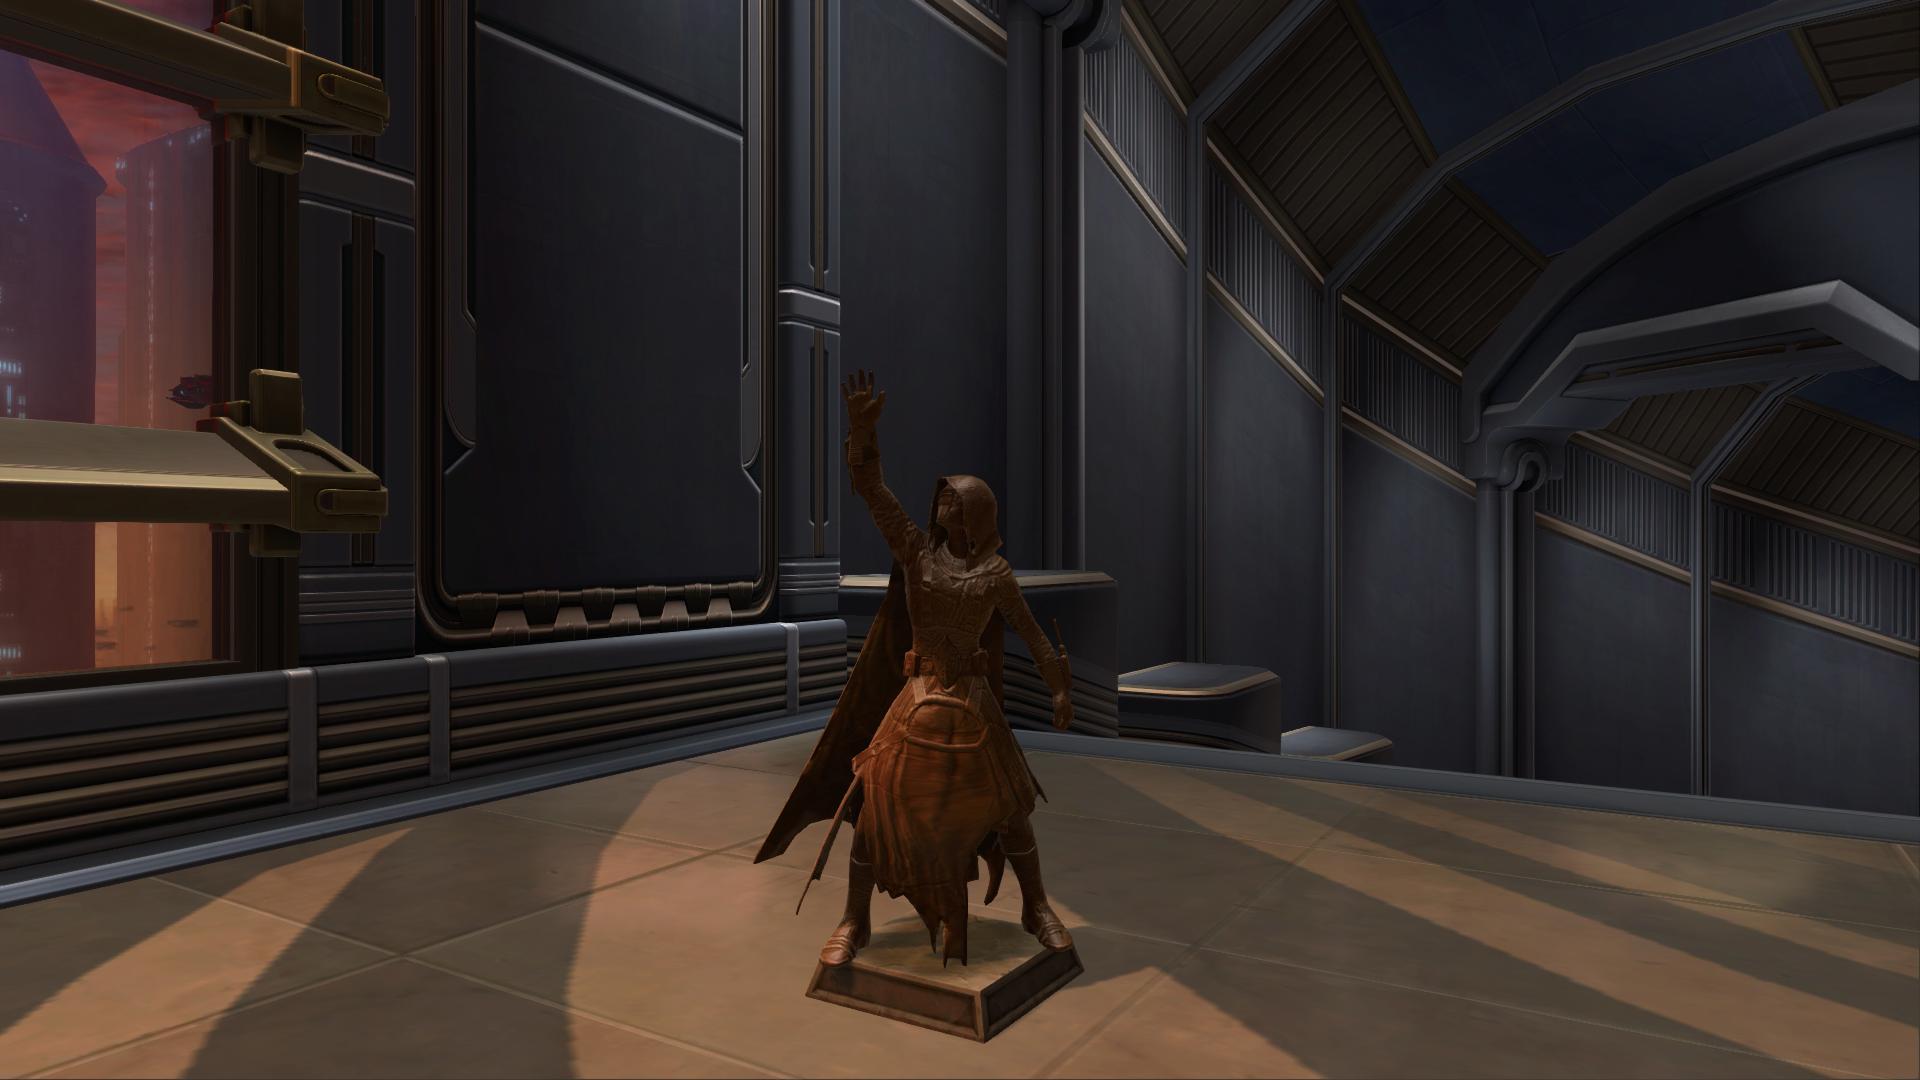 Commemorative Statue of Revan The Returned